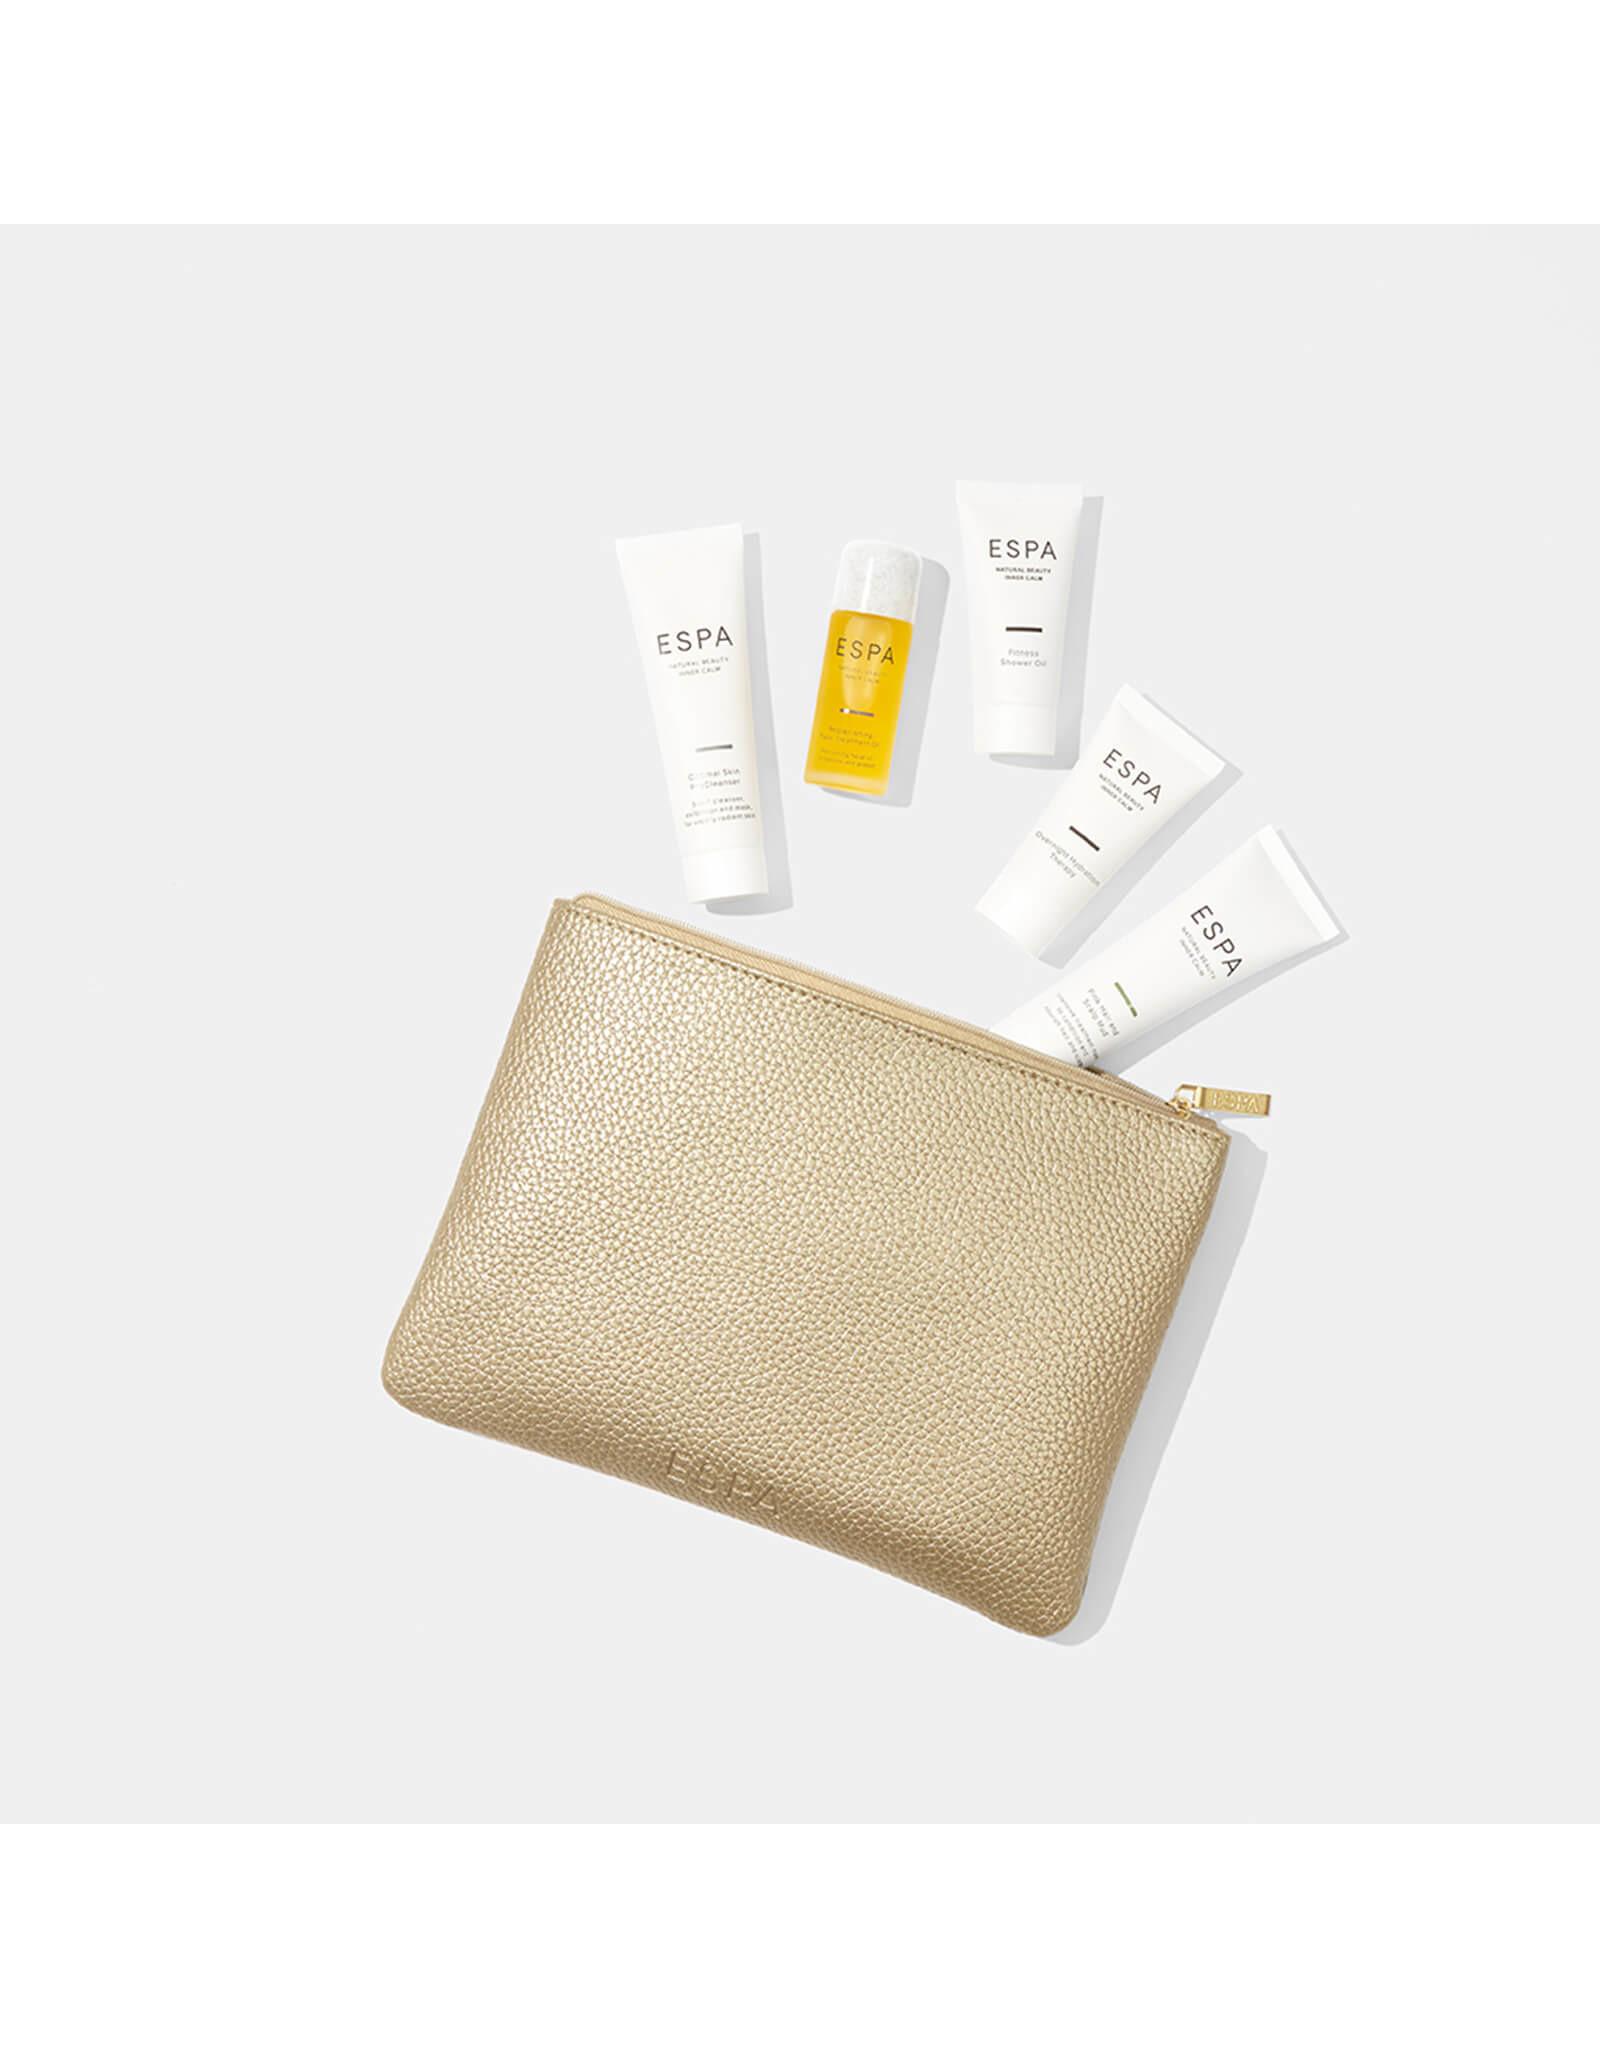 ESPA Replenish & Revitalise Bag